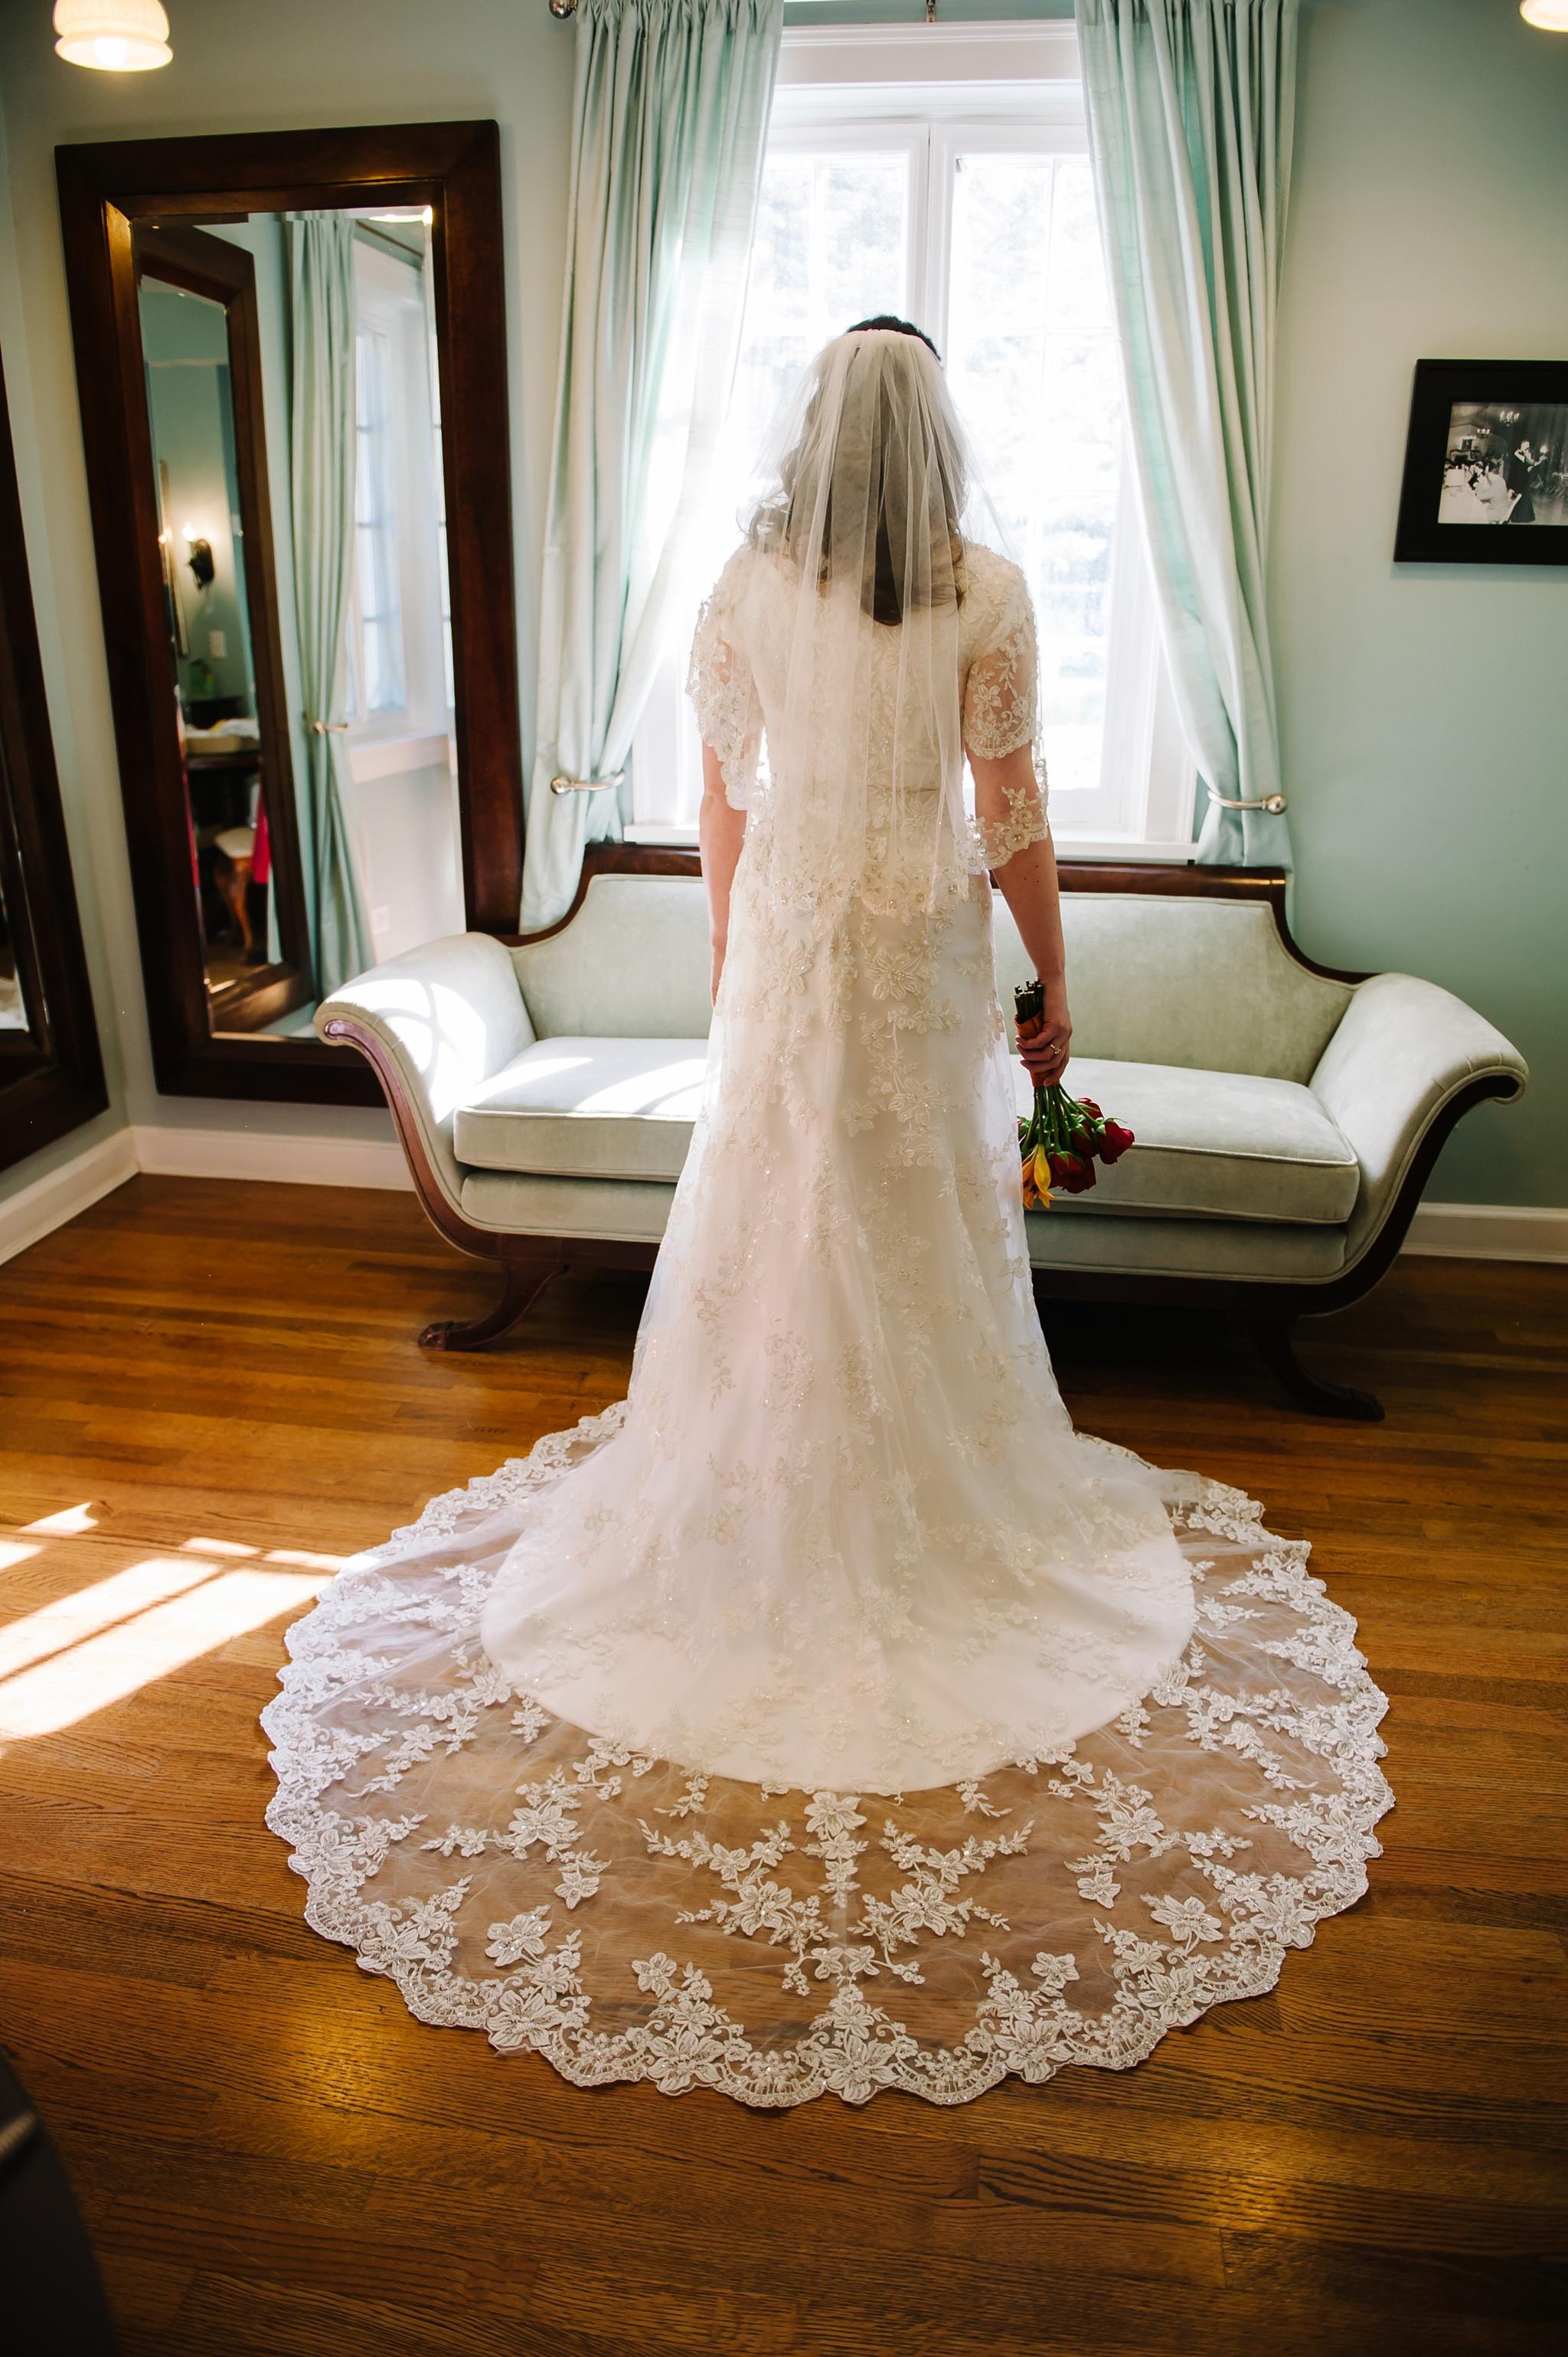 Park City Wedding Photographer Ali Sumsion 019